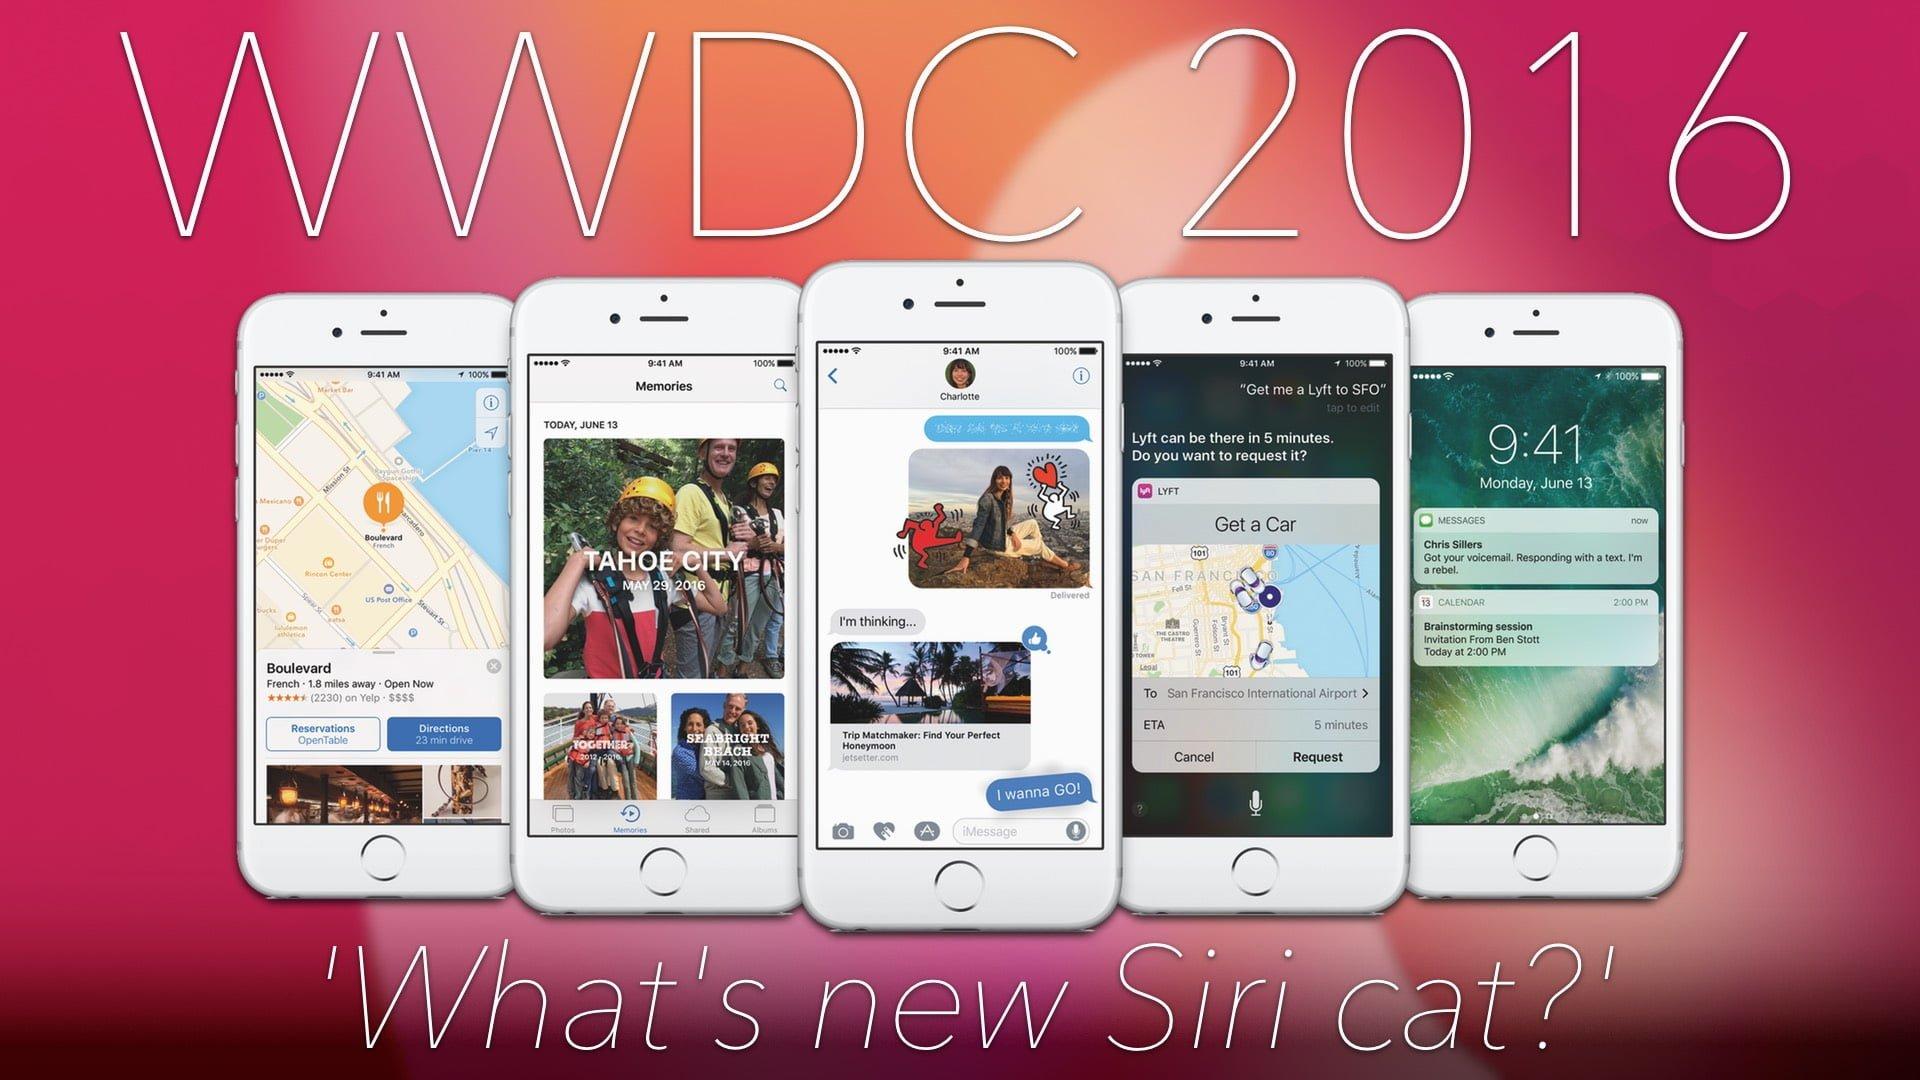 Post WWDC 2016